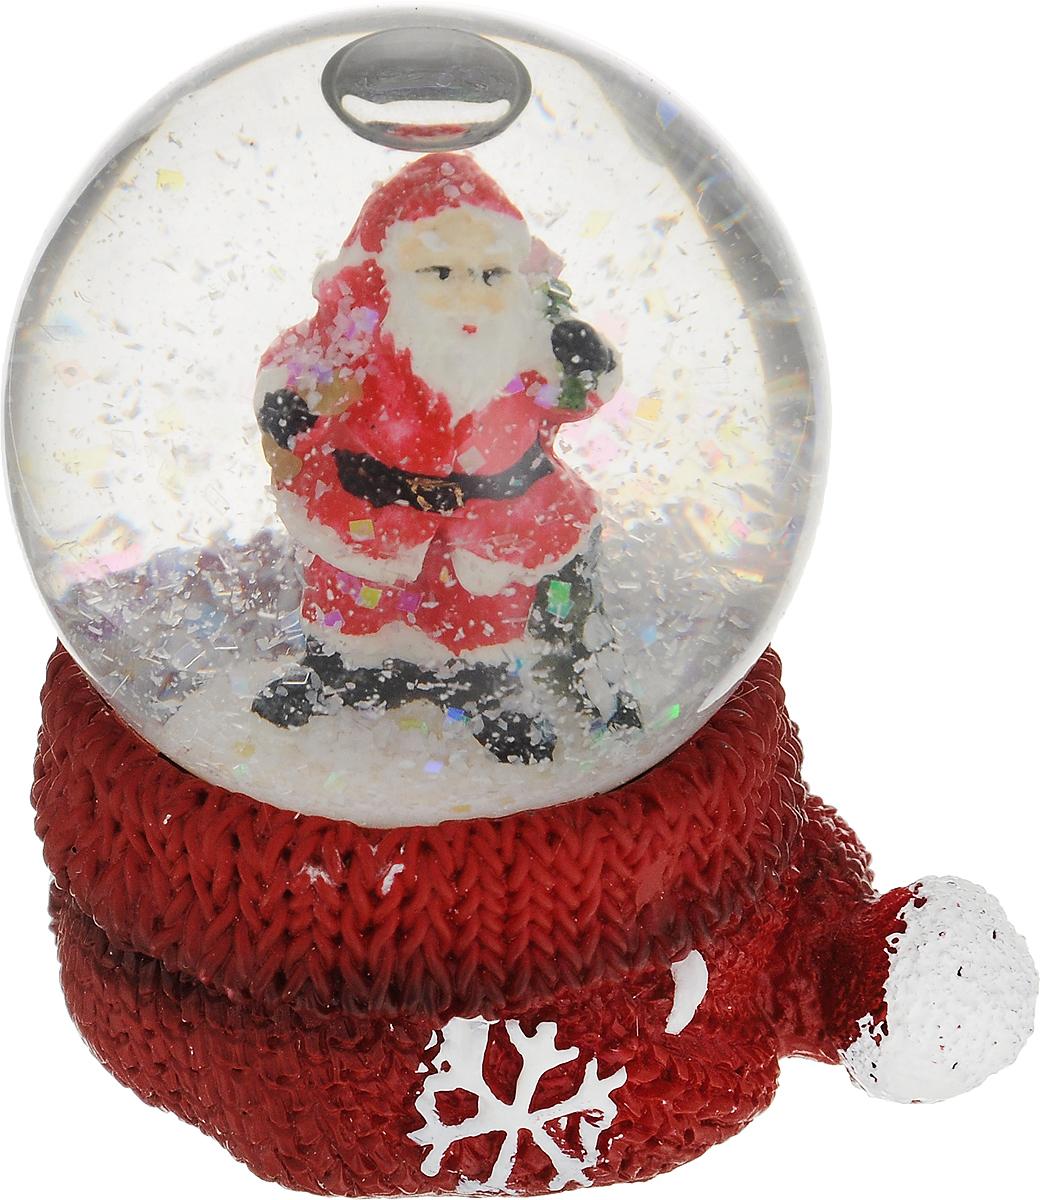 Шар водяной со снегом Дед Мороз, 6 х 5 х 6 см73380